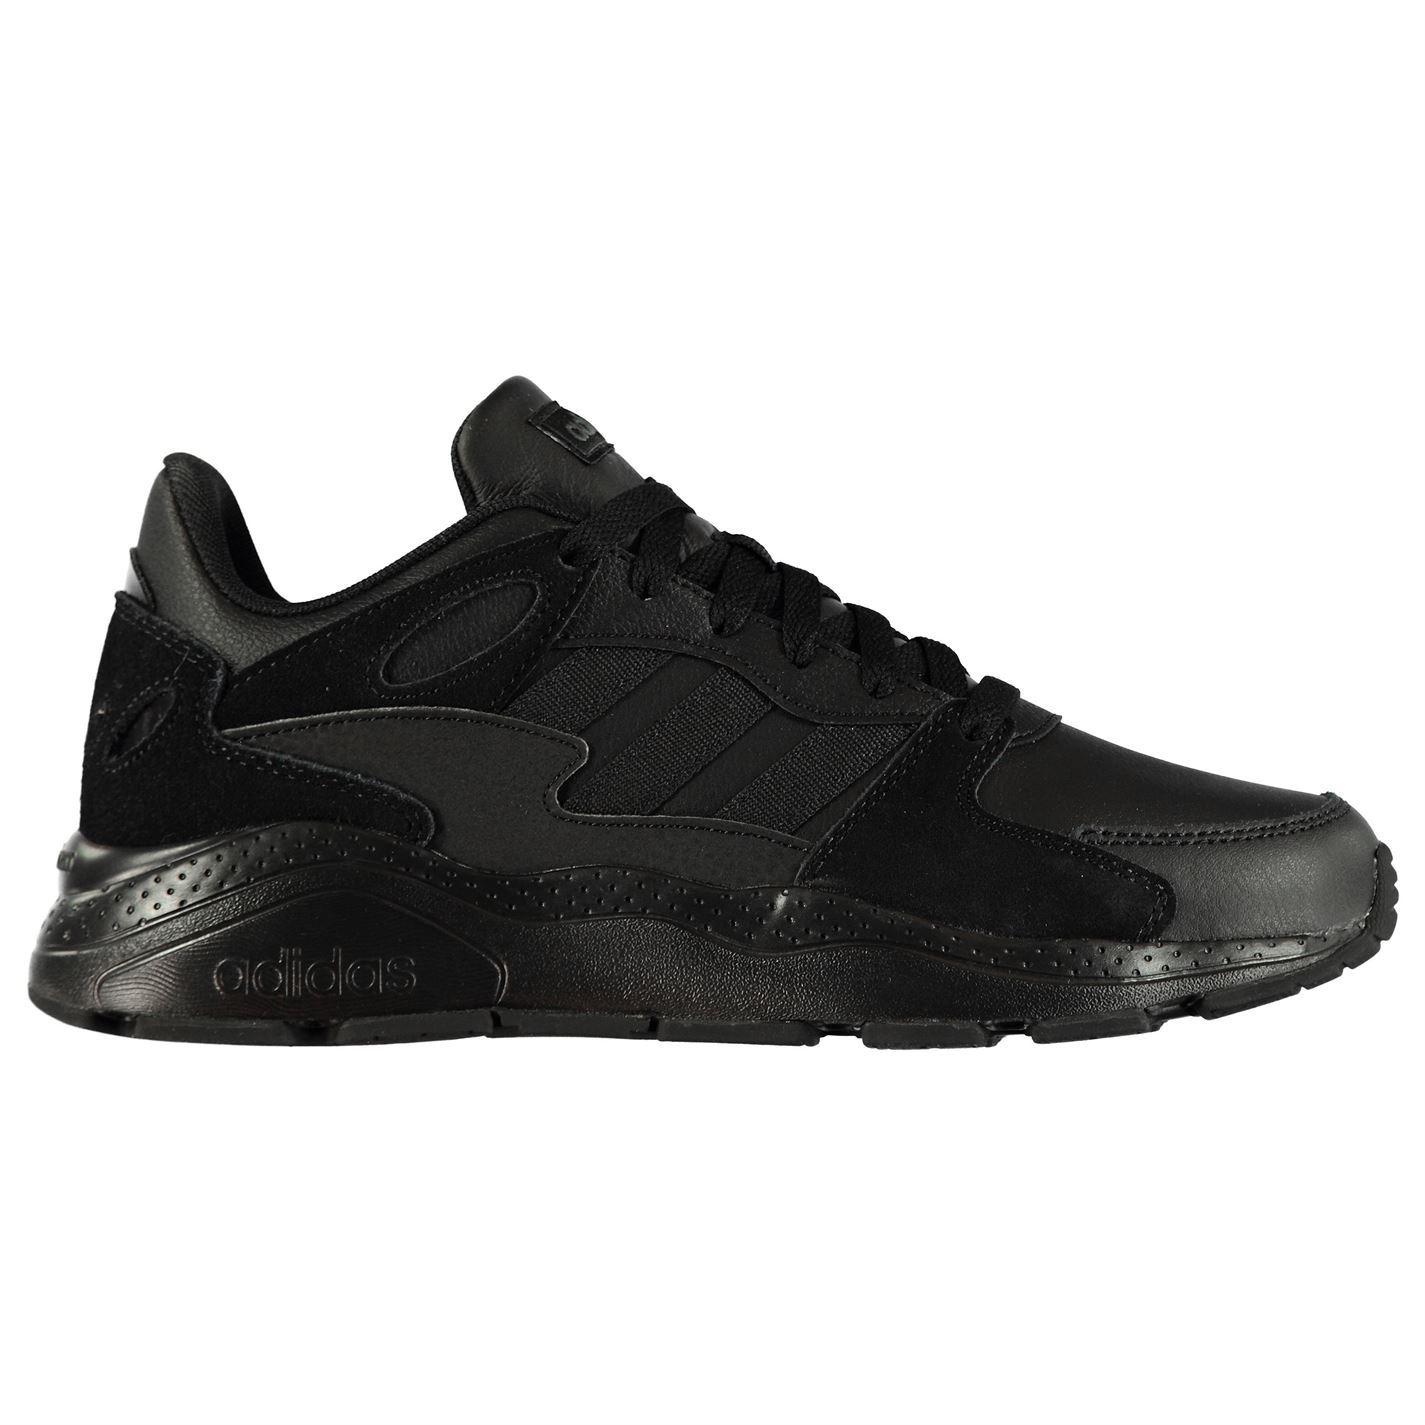 Adidas-Crazychaos-Baskets-Homme-Chaussures-De-Loisirs-Chaussures-Baskets miniature 6